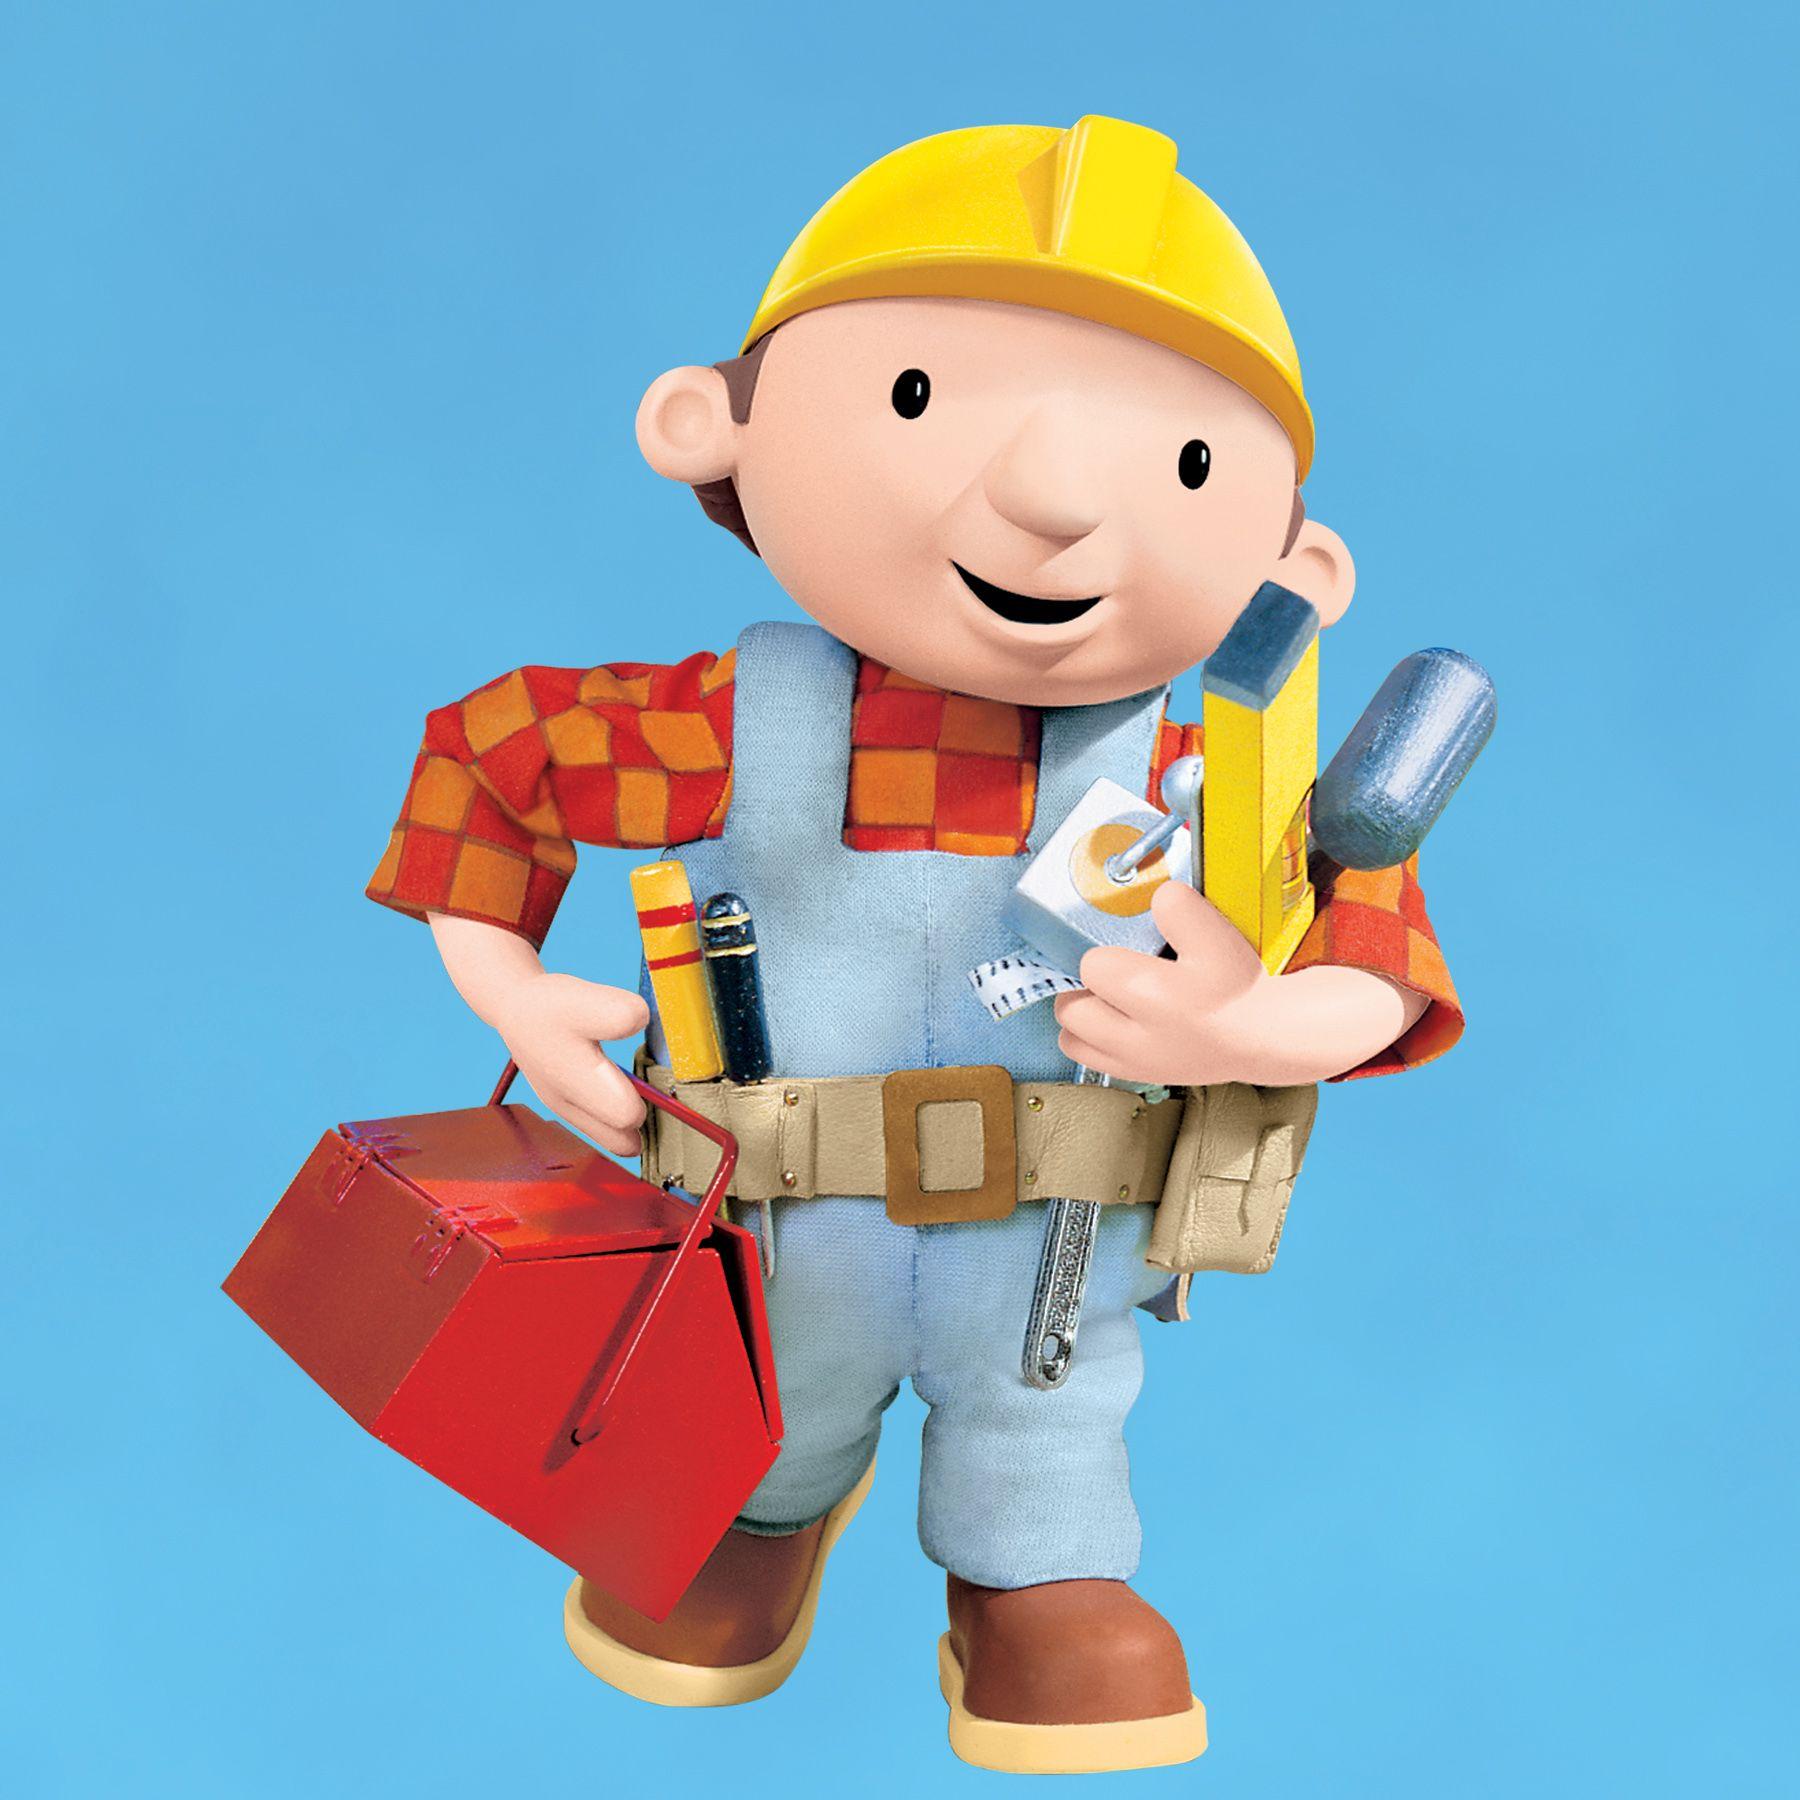 Bob the Builder... can we fix it? #bbc #wfyi | Marido de ...